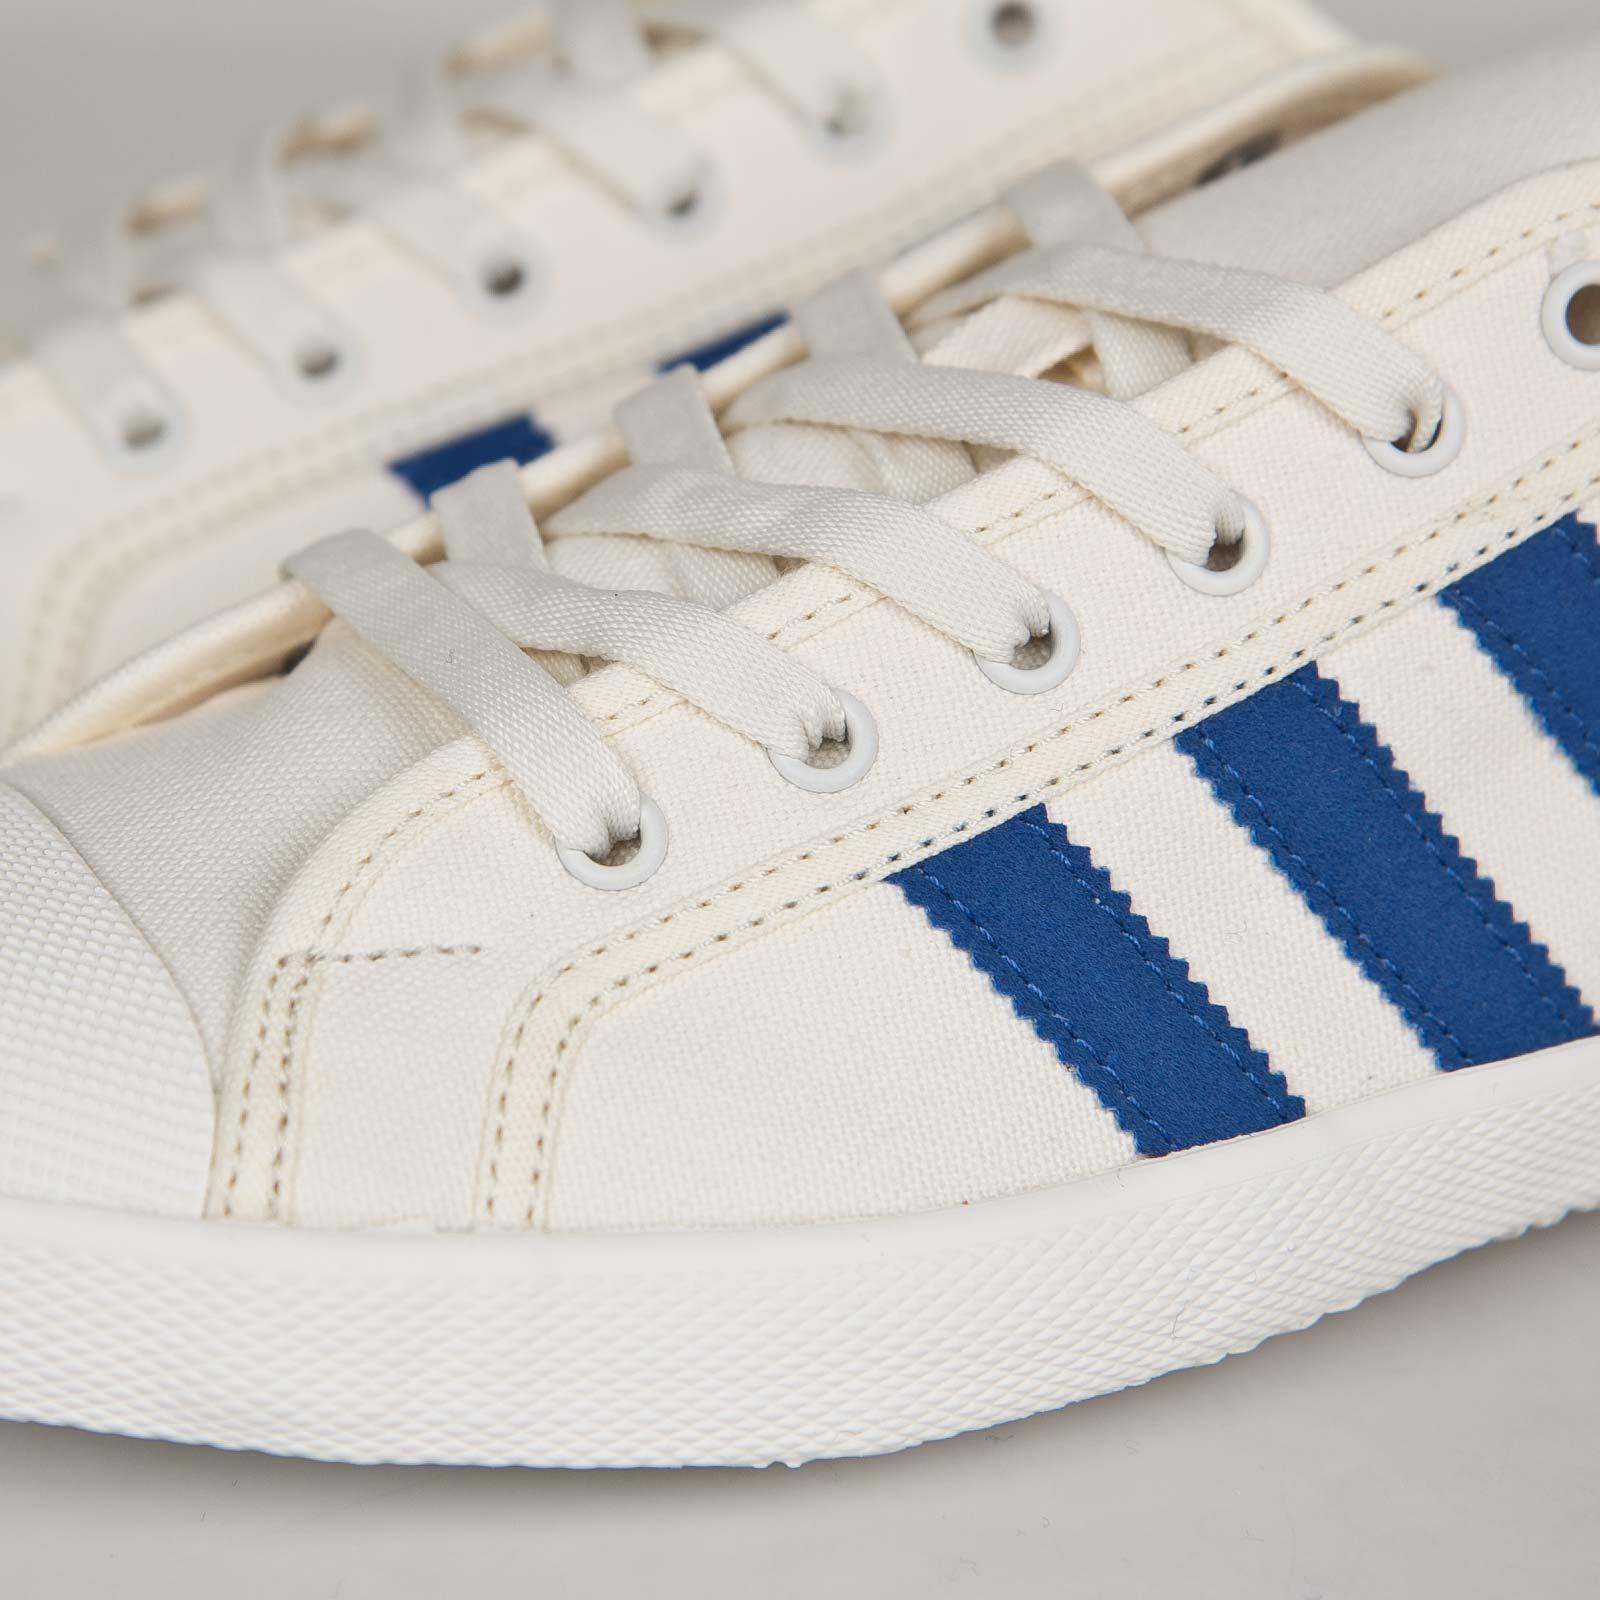 adidas Adria SPZL - B26026 - Sneakersnstuff  1ae24453c723